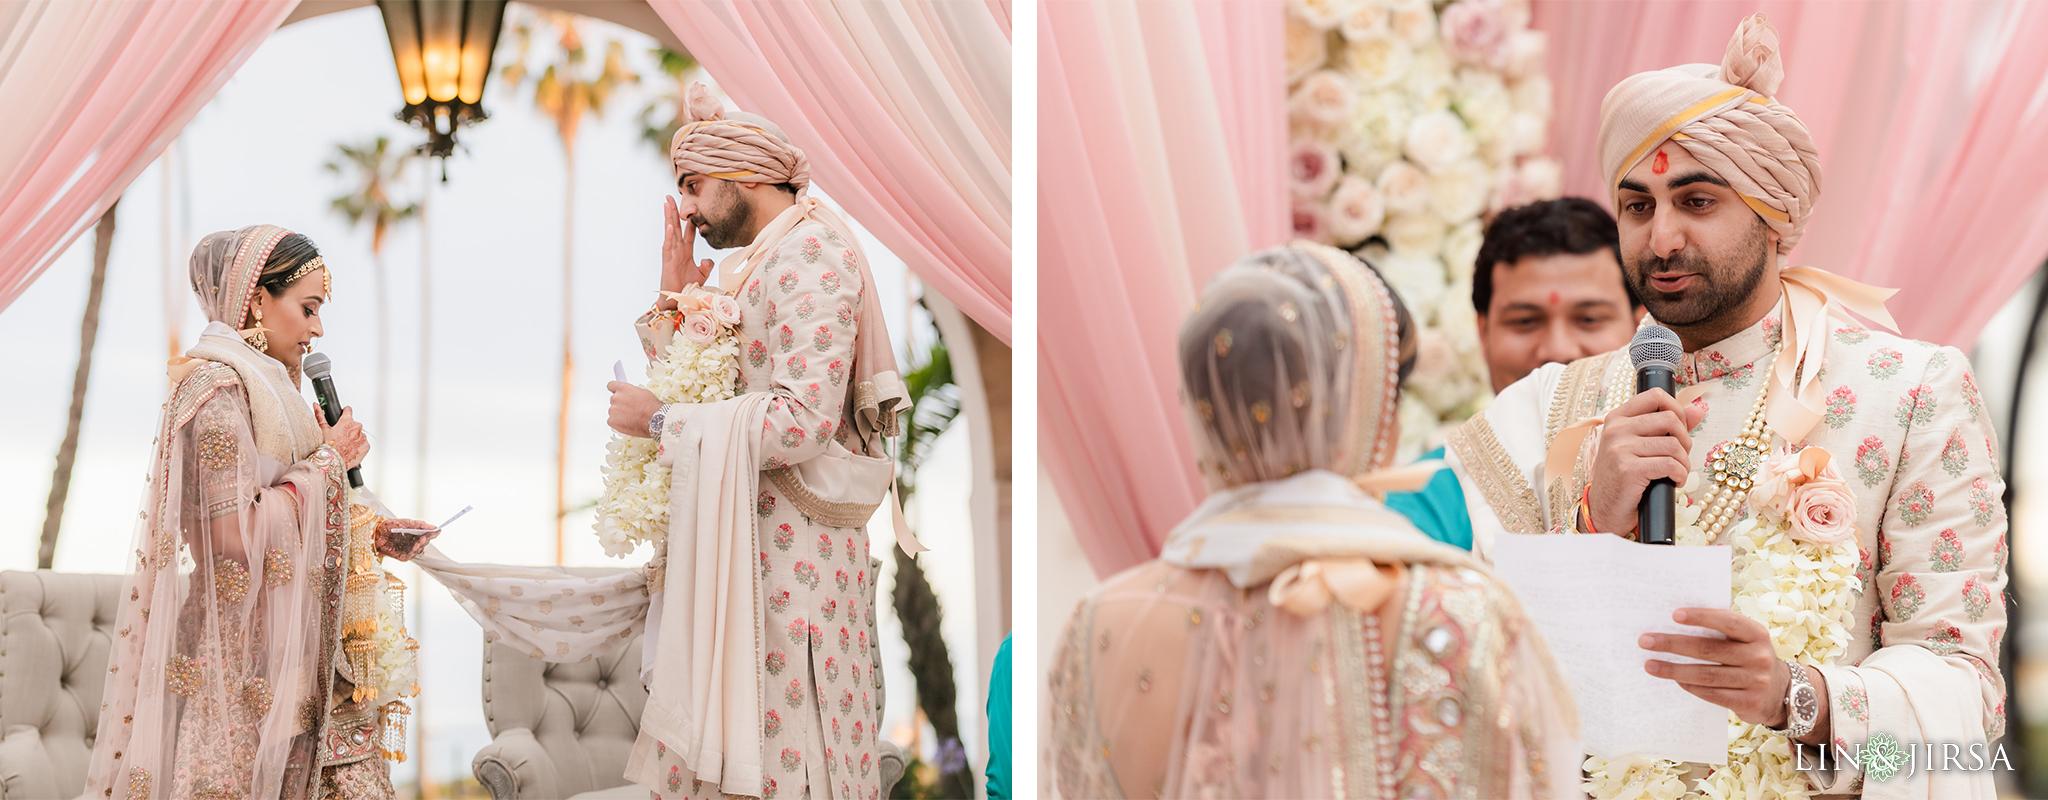 53 Hilton Santa Barbara Beachfront Resort Hindu Wedding Ceremony Photography